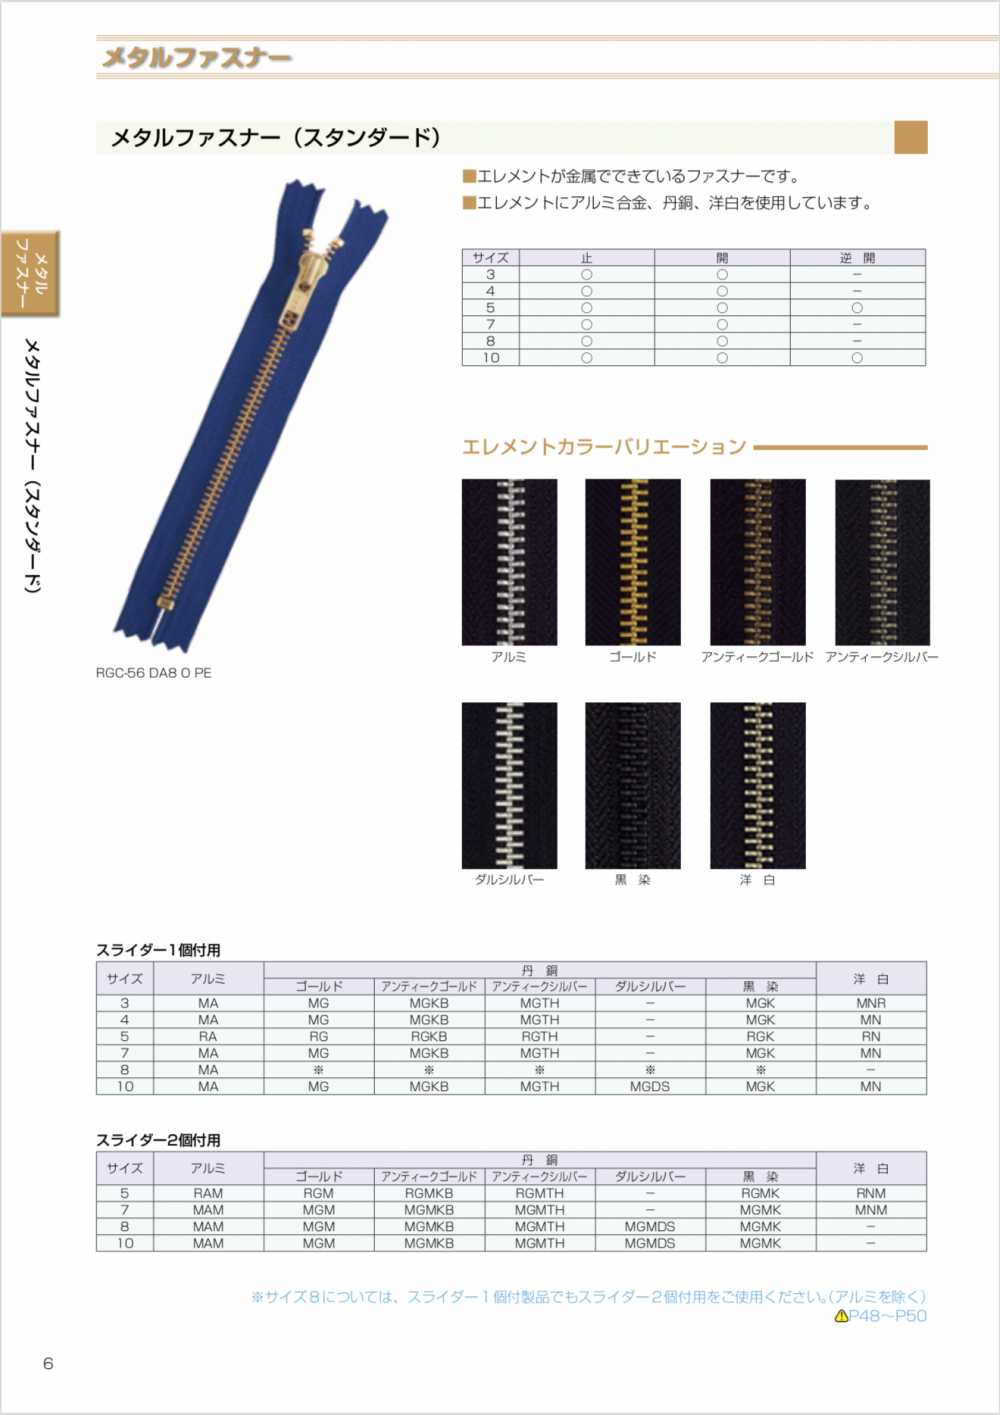 10MGTHOR YKKメタルファスナー 10サイズ アンティークシルバー オープン YKK/オークラ商事 - ApparelX アパレル資材卸通販